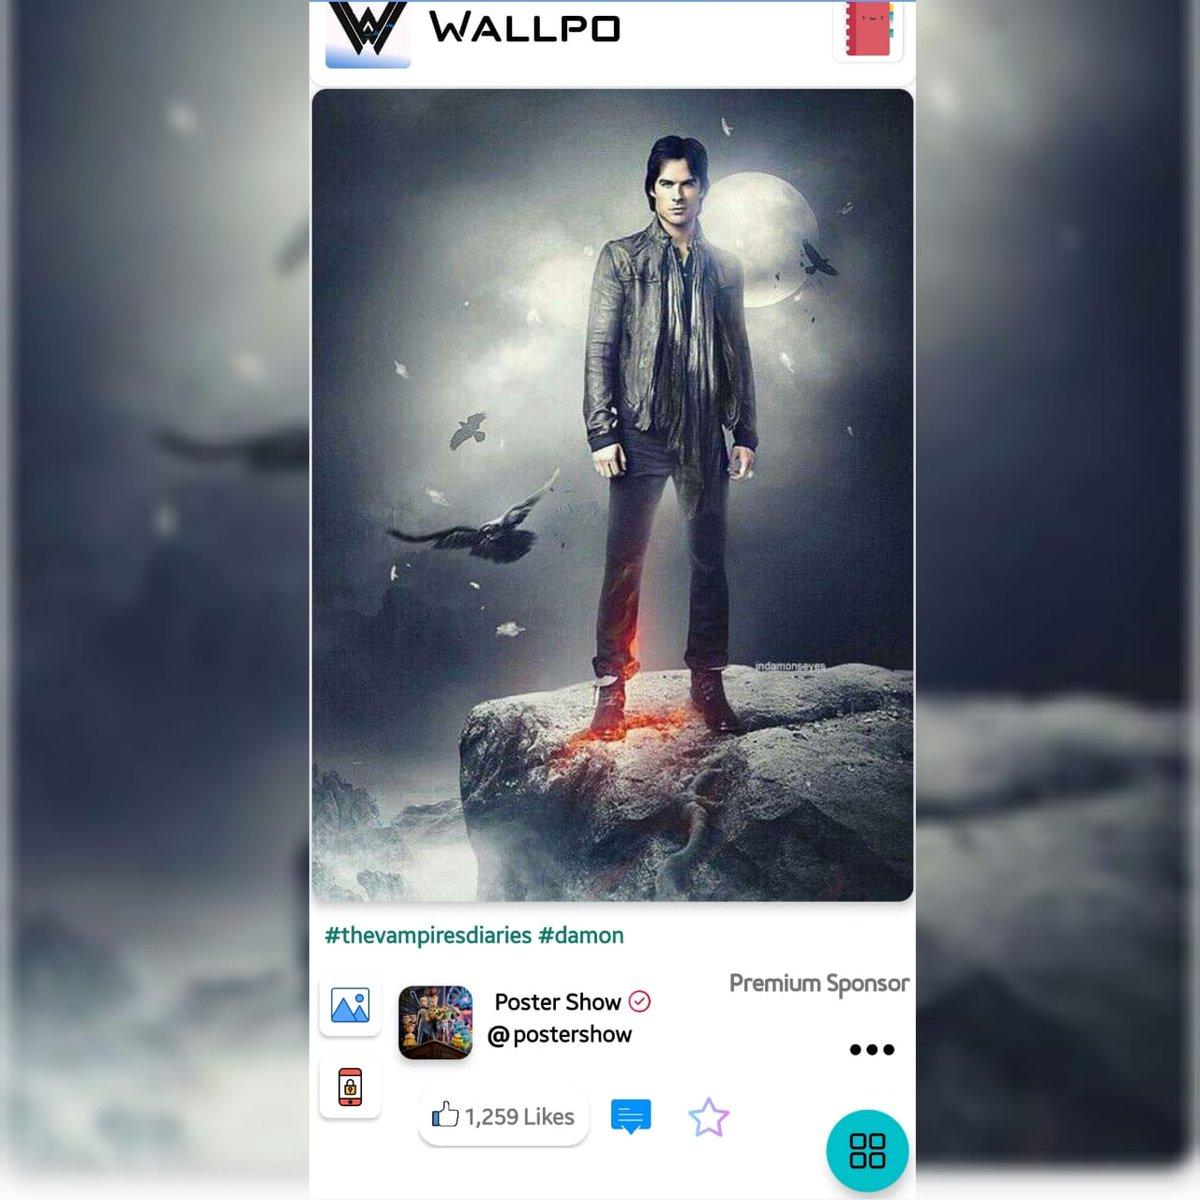 @iansomerhalder  as #damonsalvatore in @cwtvd  #thevampirediaries wallpapers arrived on #wallpo.. #tvd #tvdedits #tvdedit #tvdmemes #tvdscenes #tvdrp #thevampirediaries #thevampirediariesedit #damonsalvatore #damonsalvatoreedits #iansomerhalder .  https://thewallpo.compic.twitter.com/5cM6uZllgc